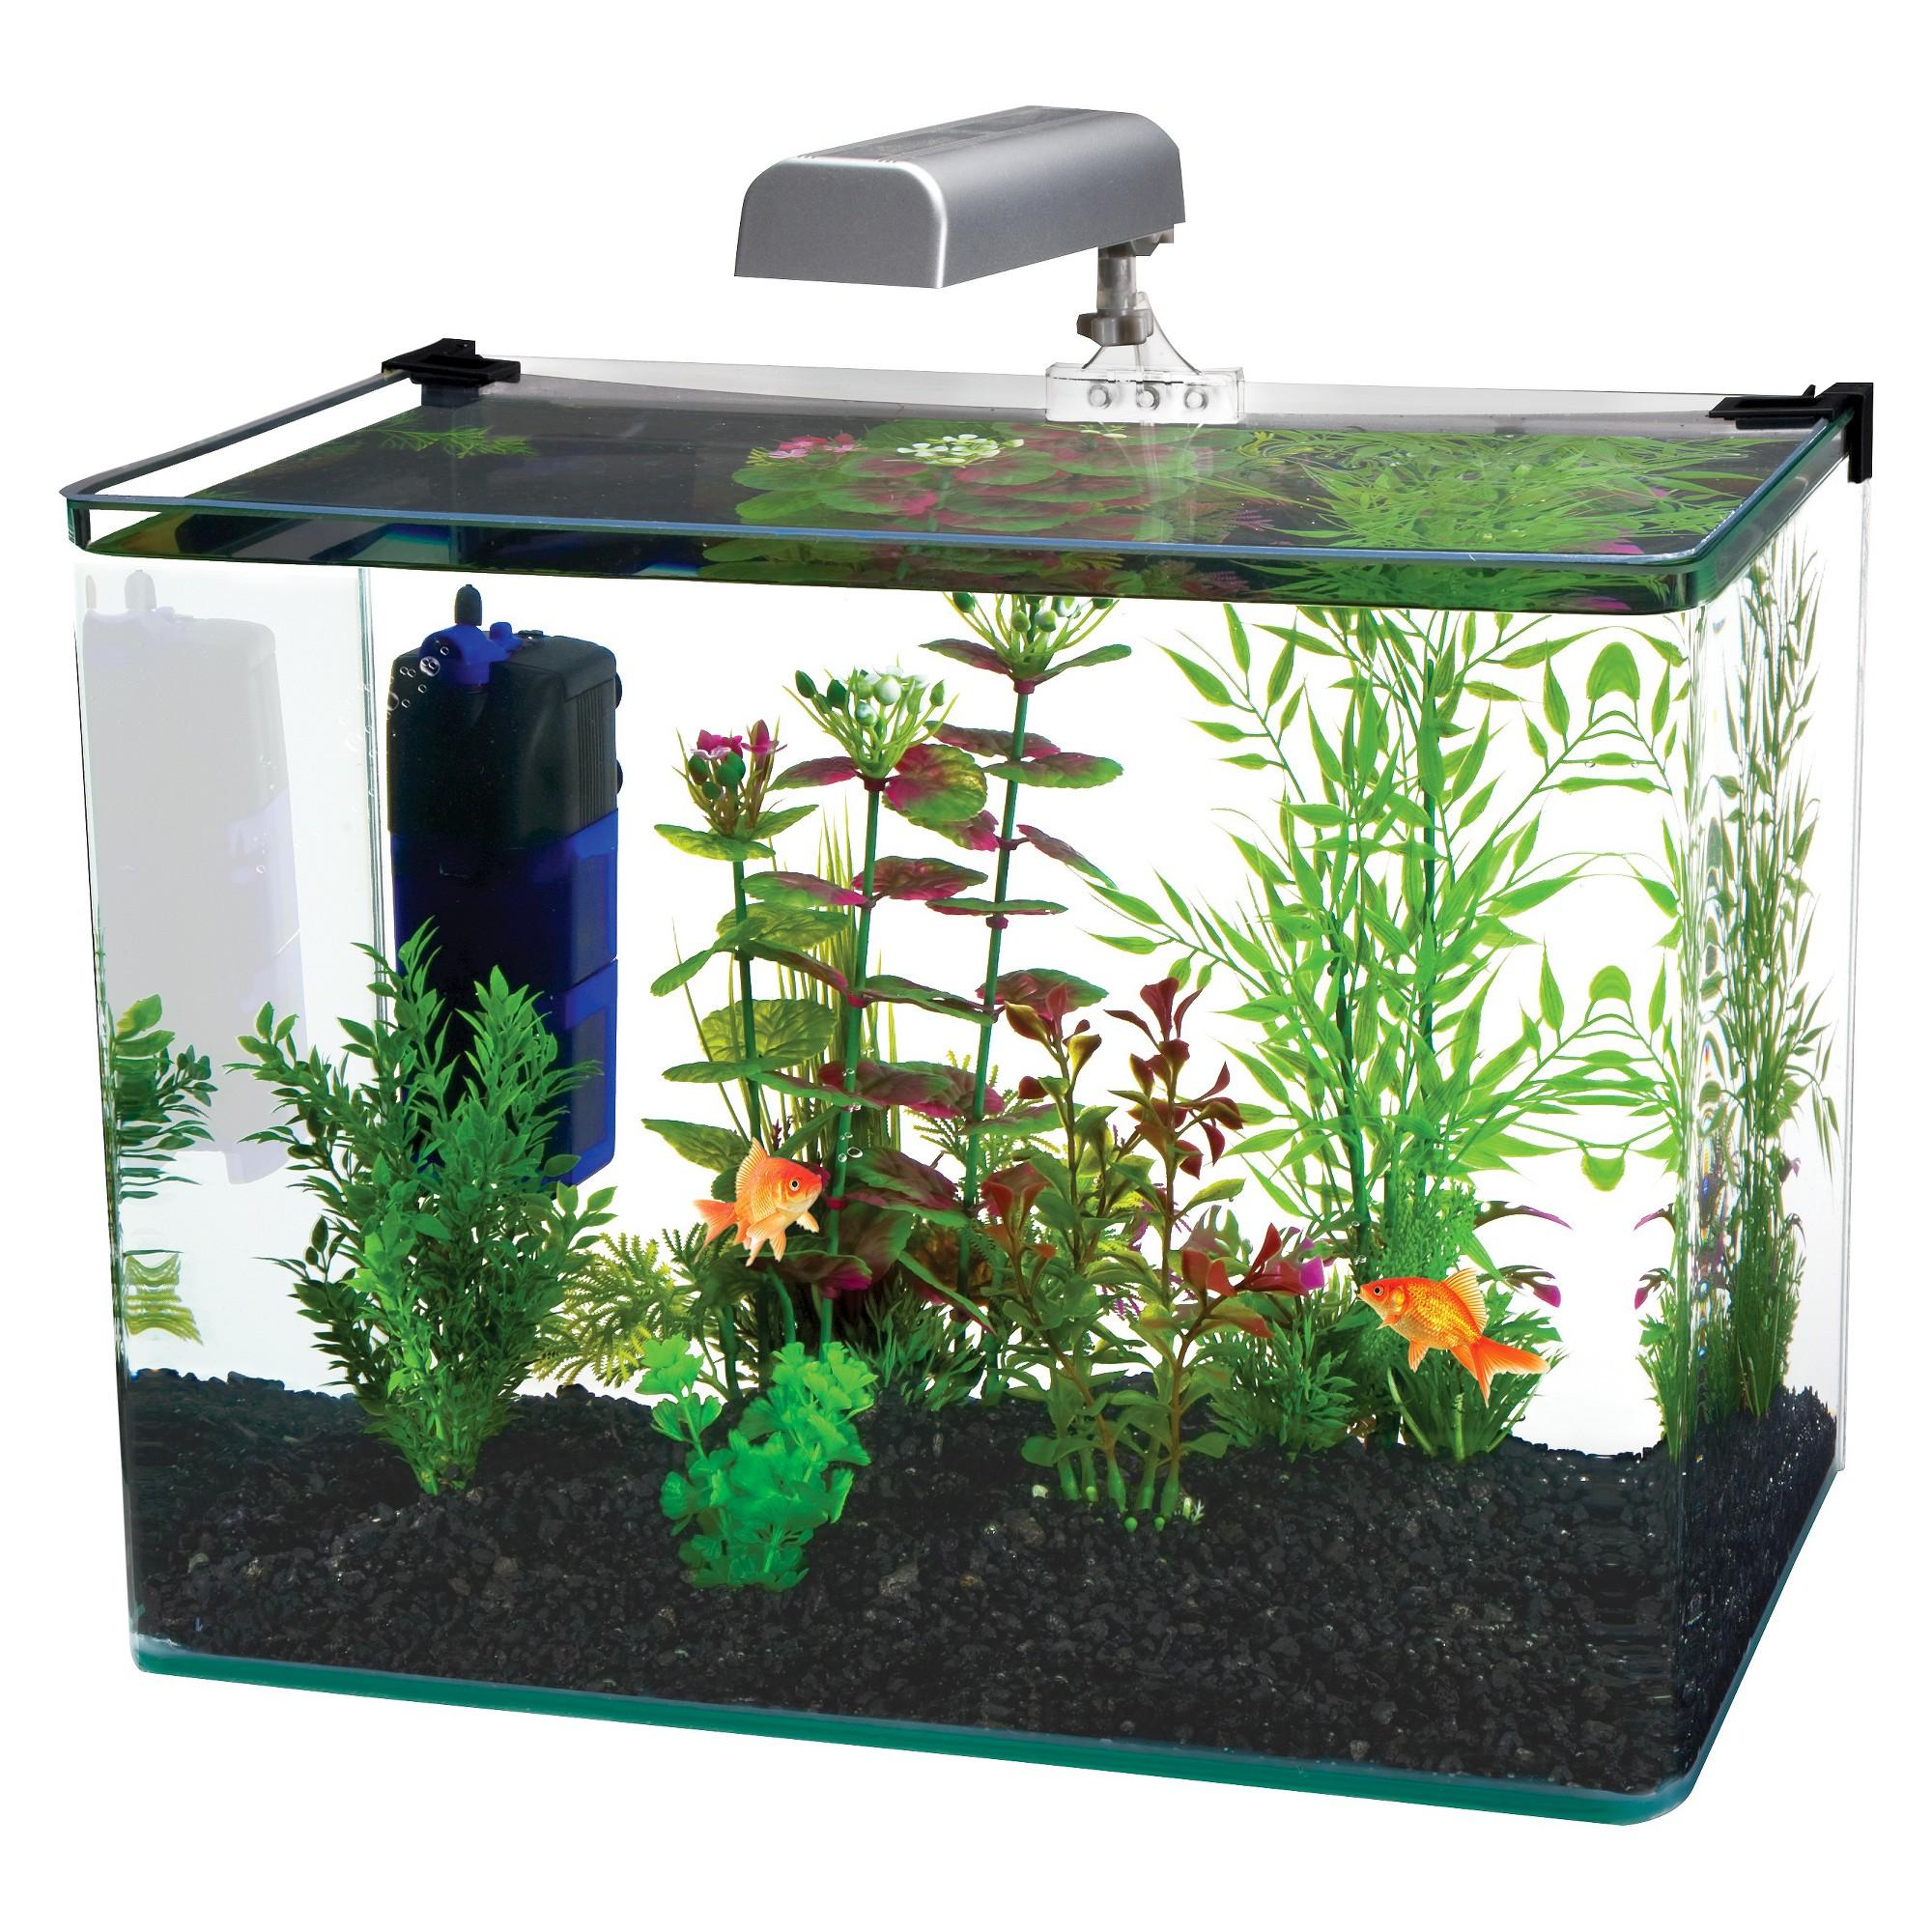 Water World RADIUS Desktop 7.5-Gallon Aquarium Kit With